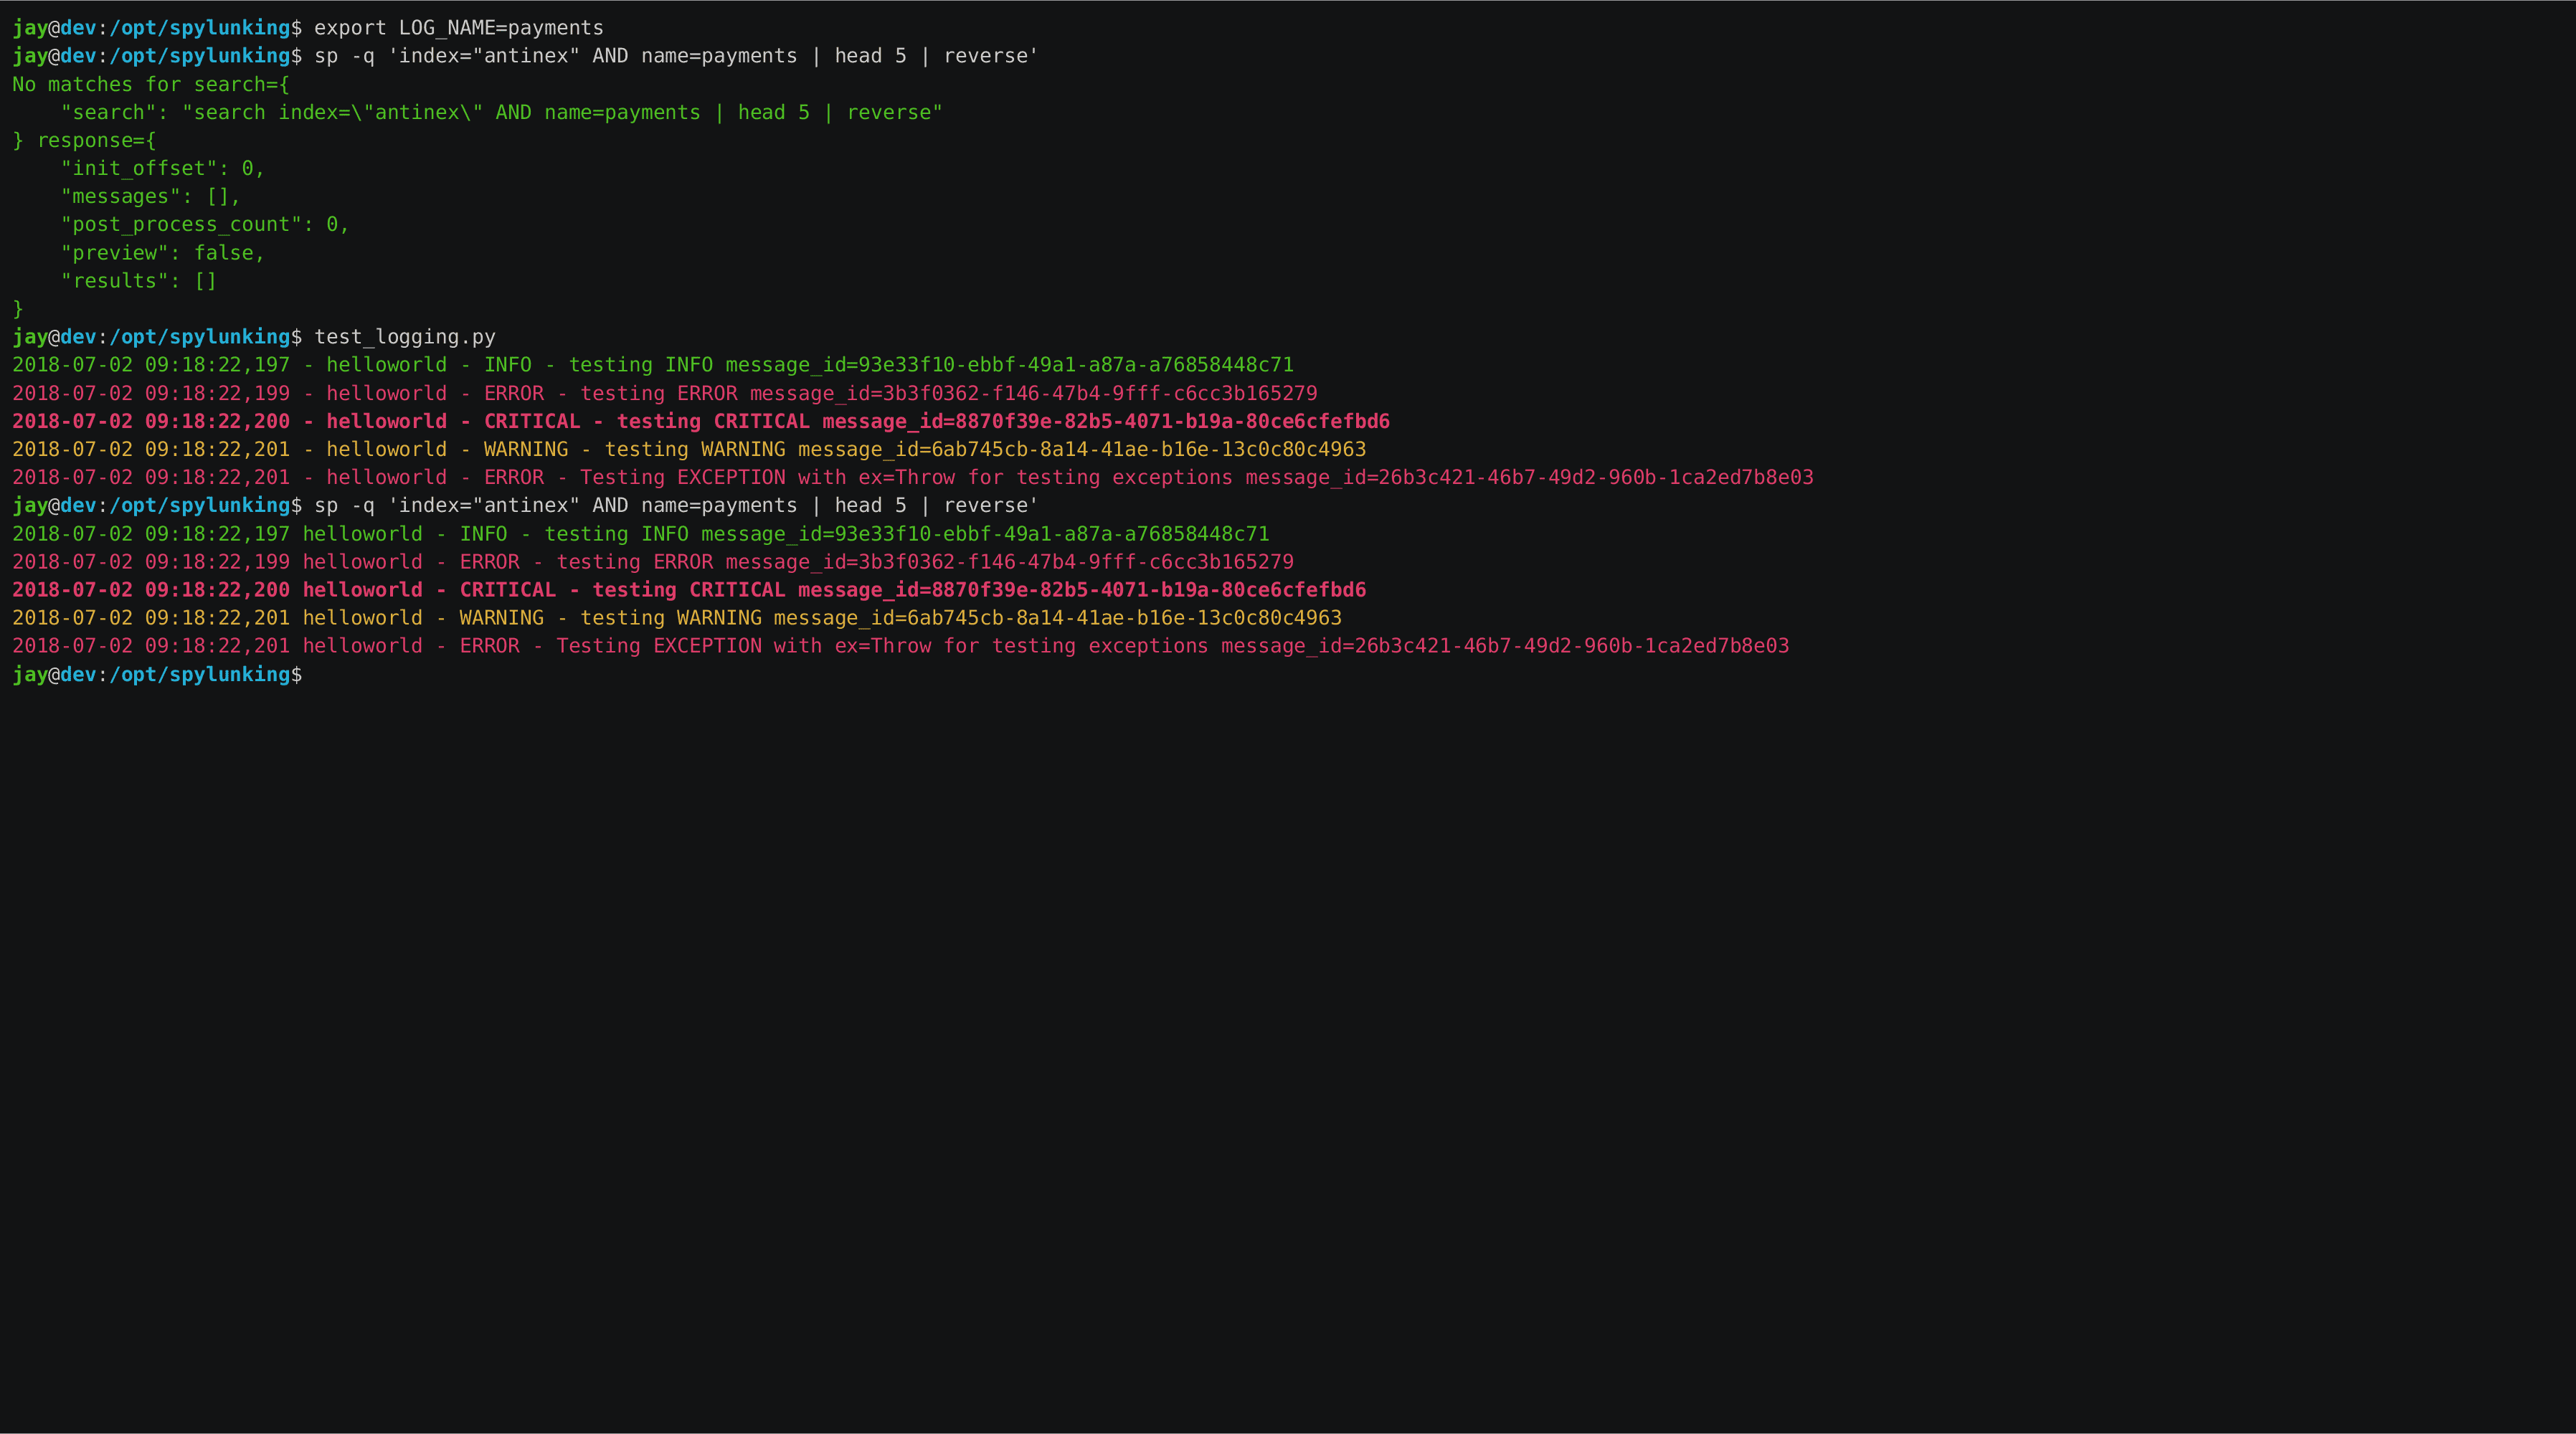 spylunking/README rst at master · jay-johnson/spylunking · GitHub